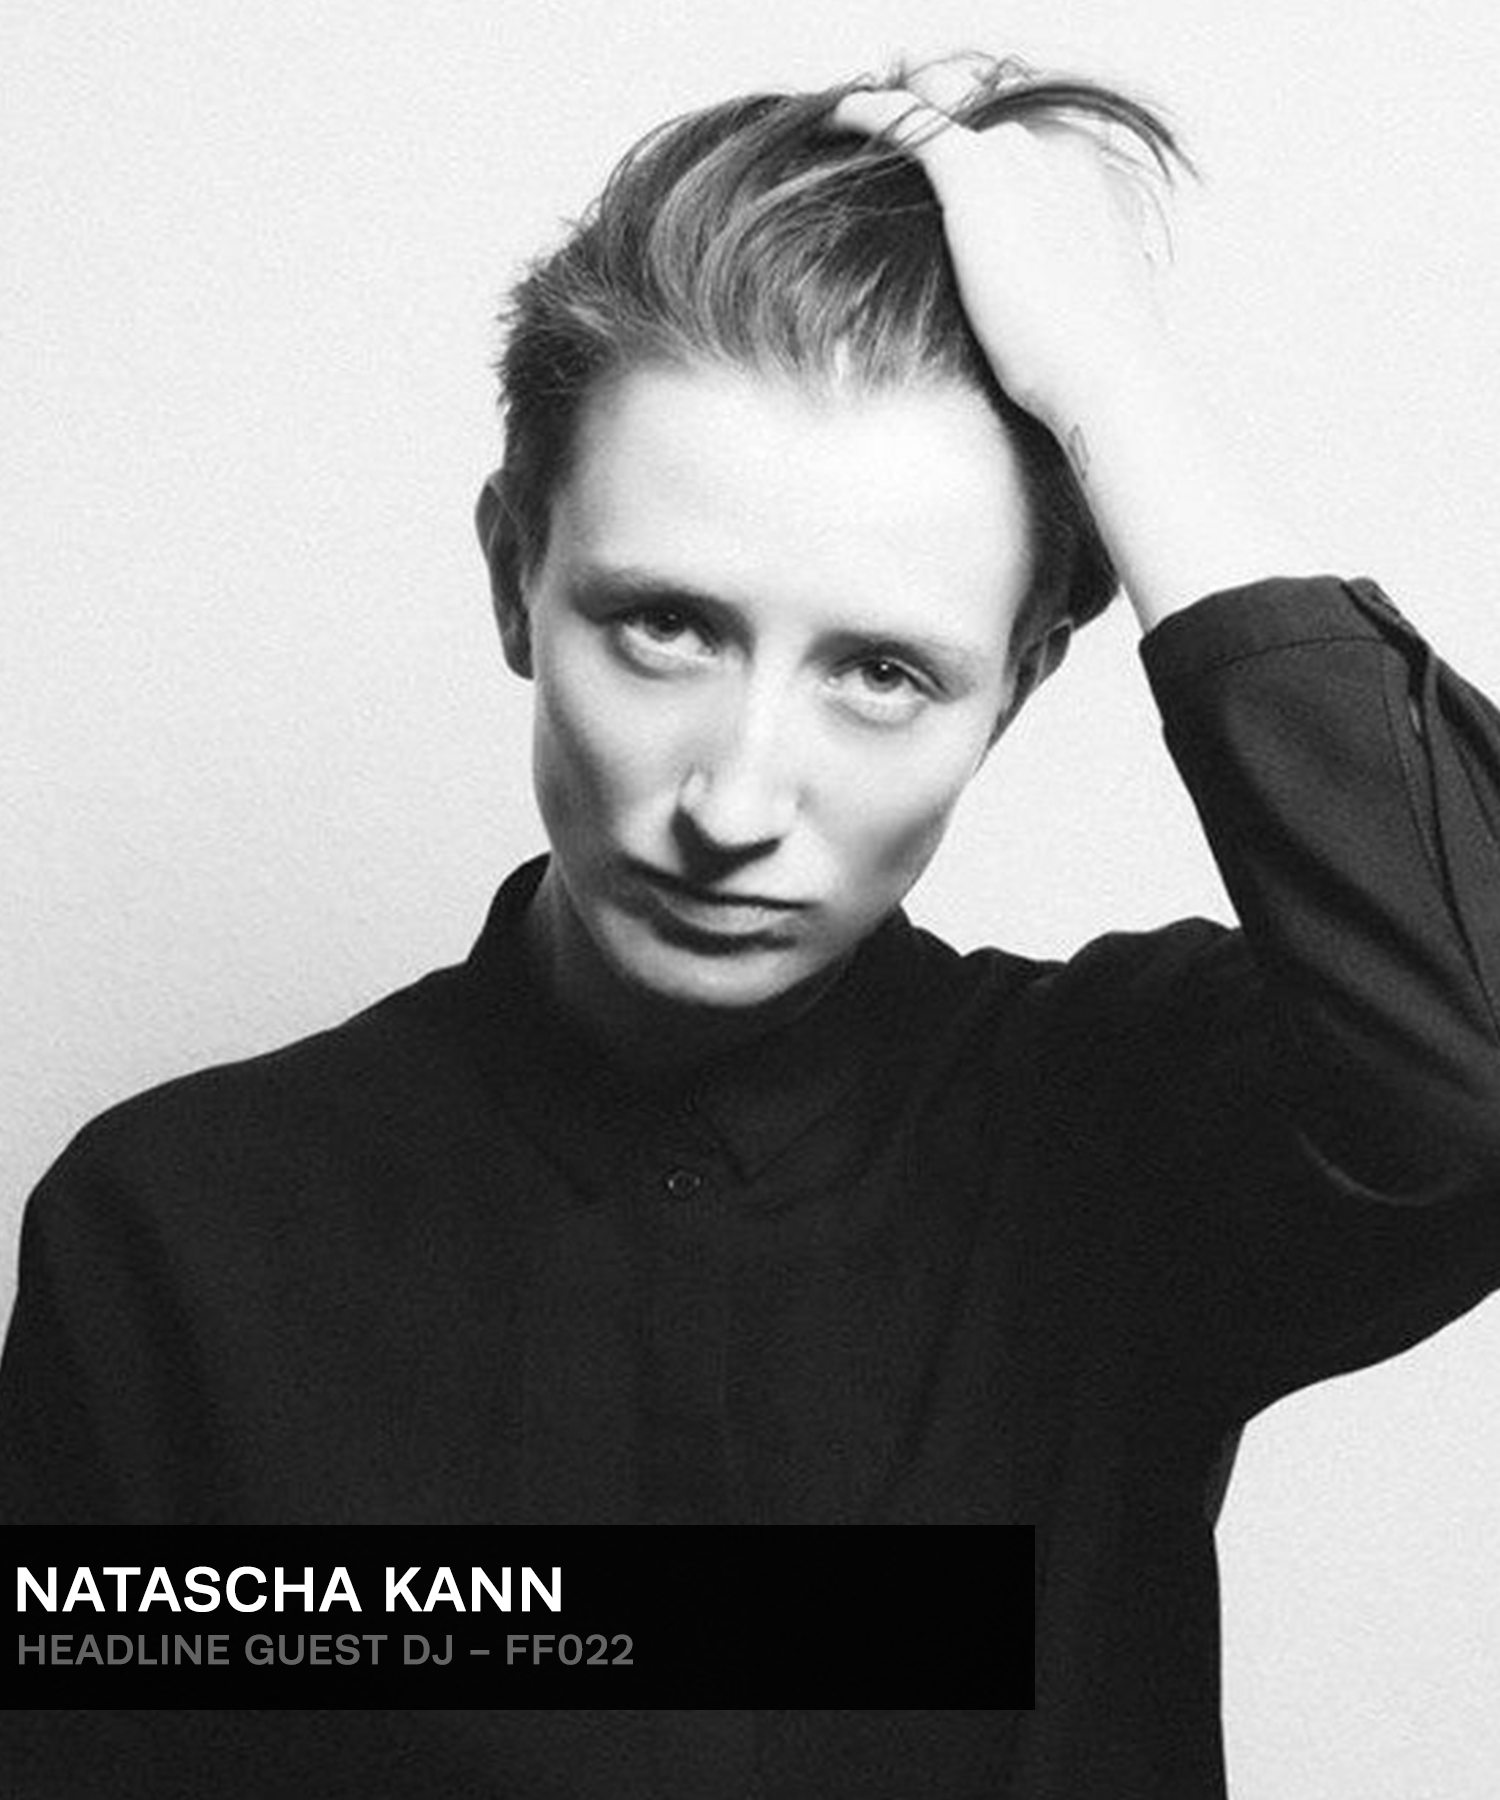 NATASCHA KANN - Profile.jpg